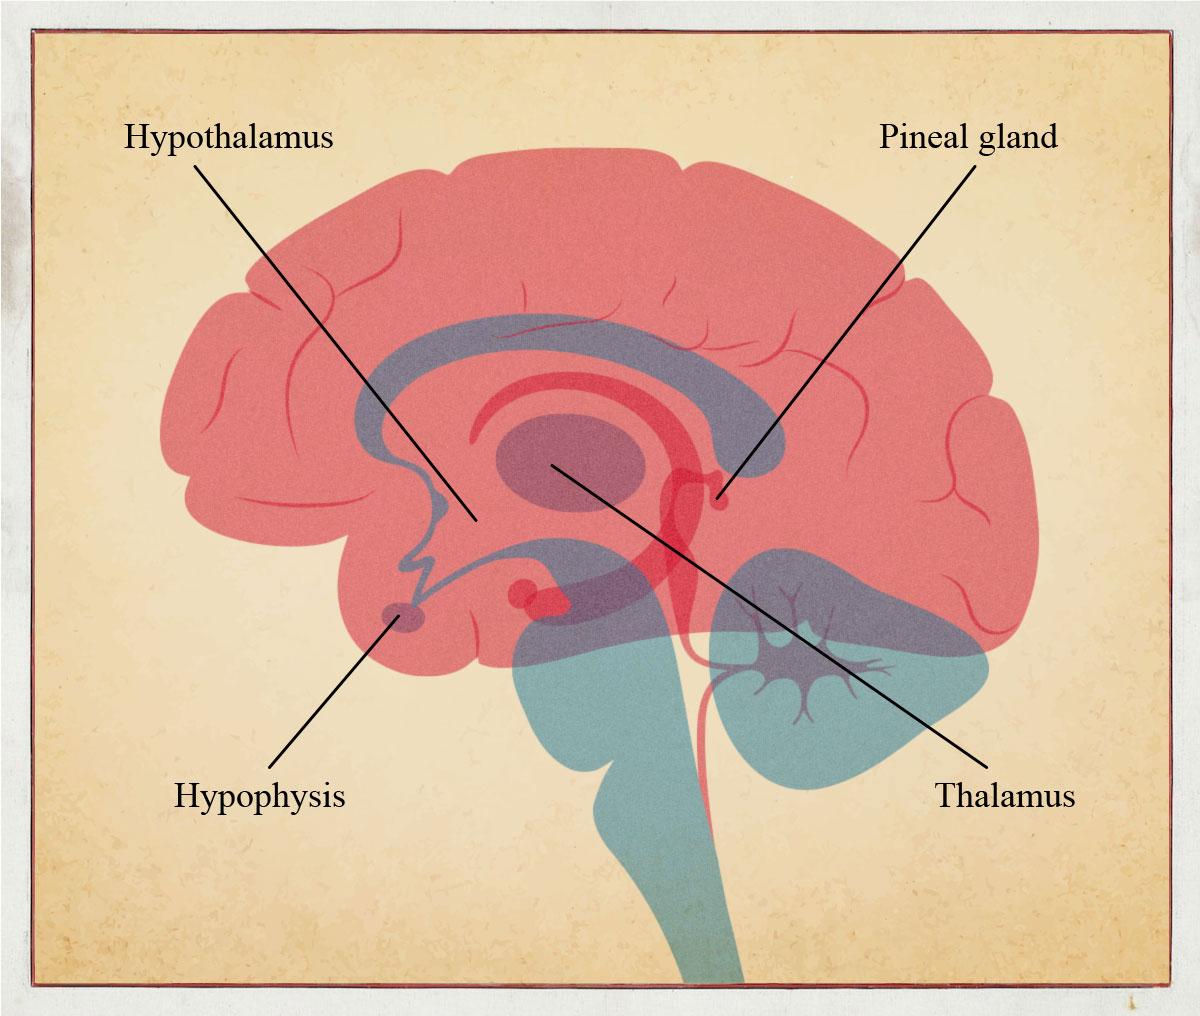 pineal hypothalamus hypophysis